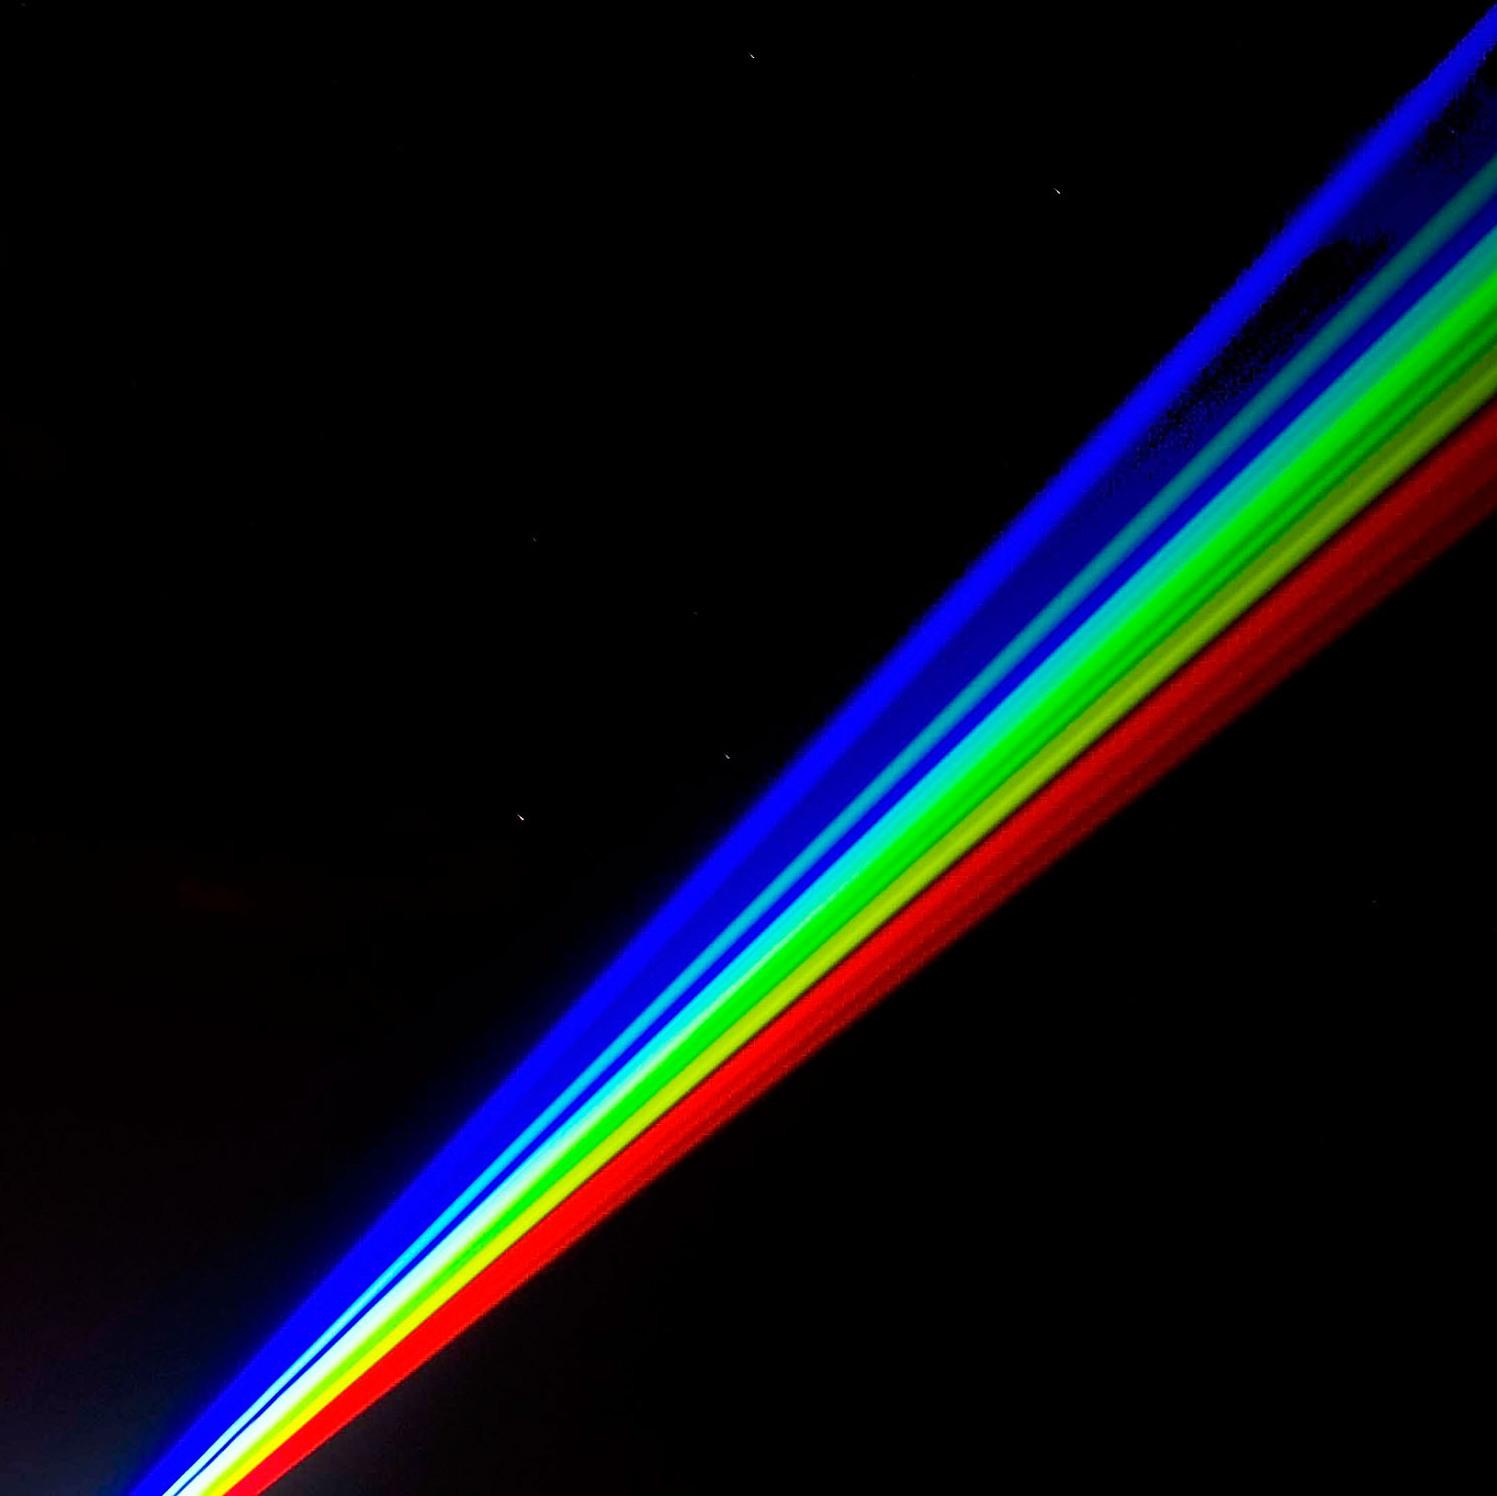 Laser background galleryhip com the hippest galleries - Galleryhip Com Filename Laserbeam_sq A1b1aac3538b2f96f49344028bfe08c966517f08 Jpg